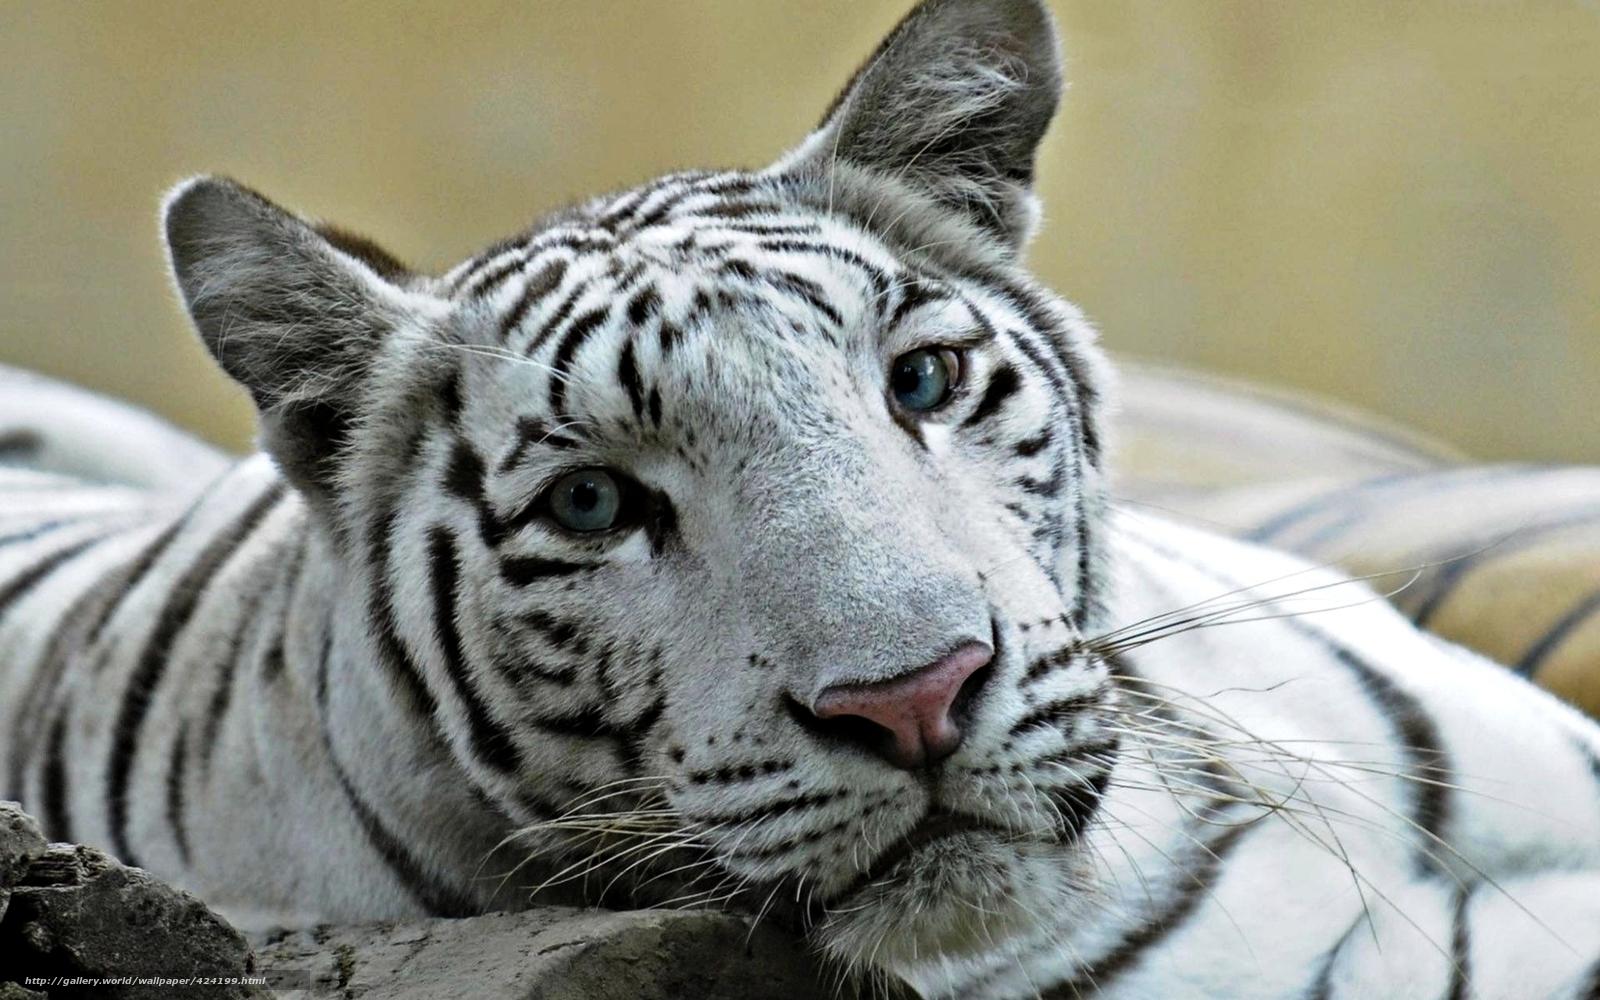 Tlcharger fond d ecran liger blanc hybride tigre fonds d ecran